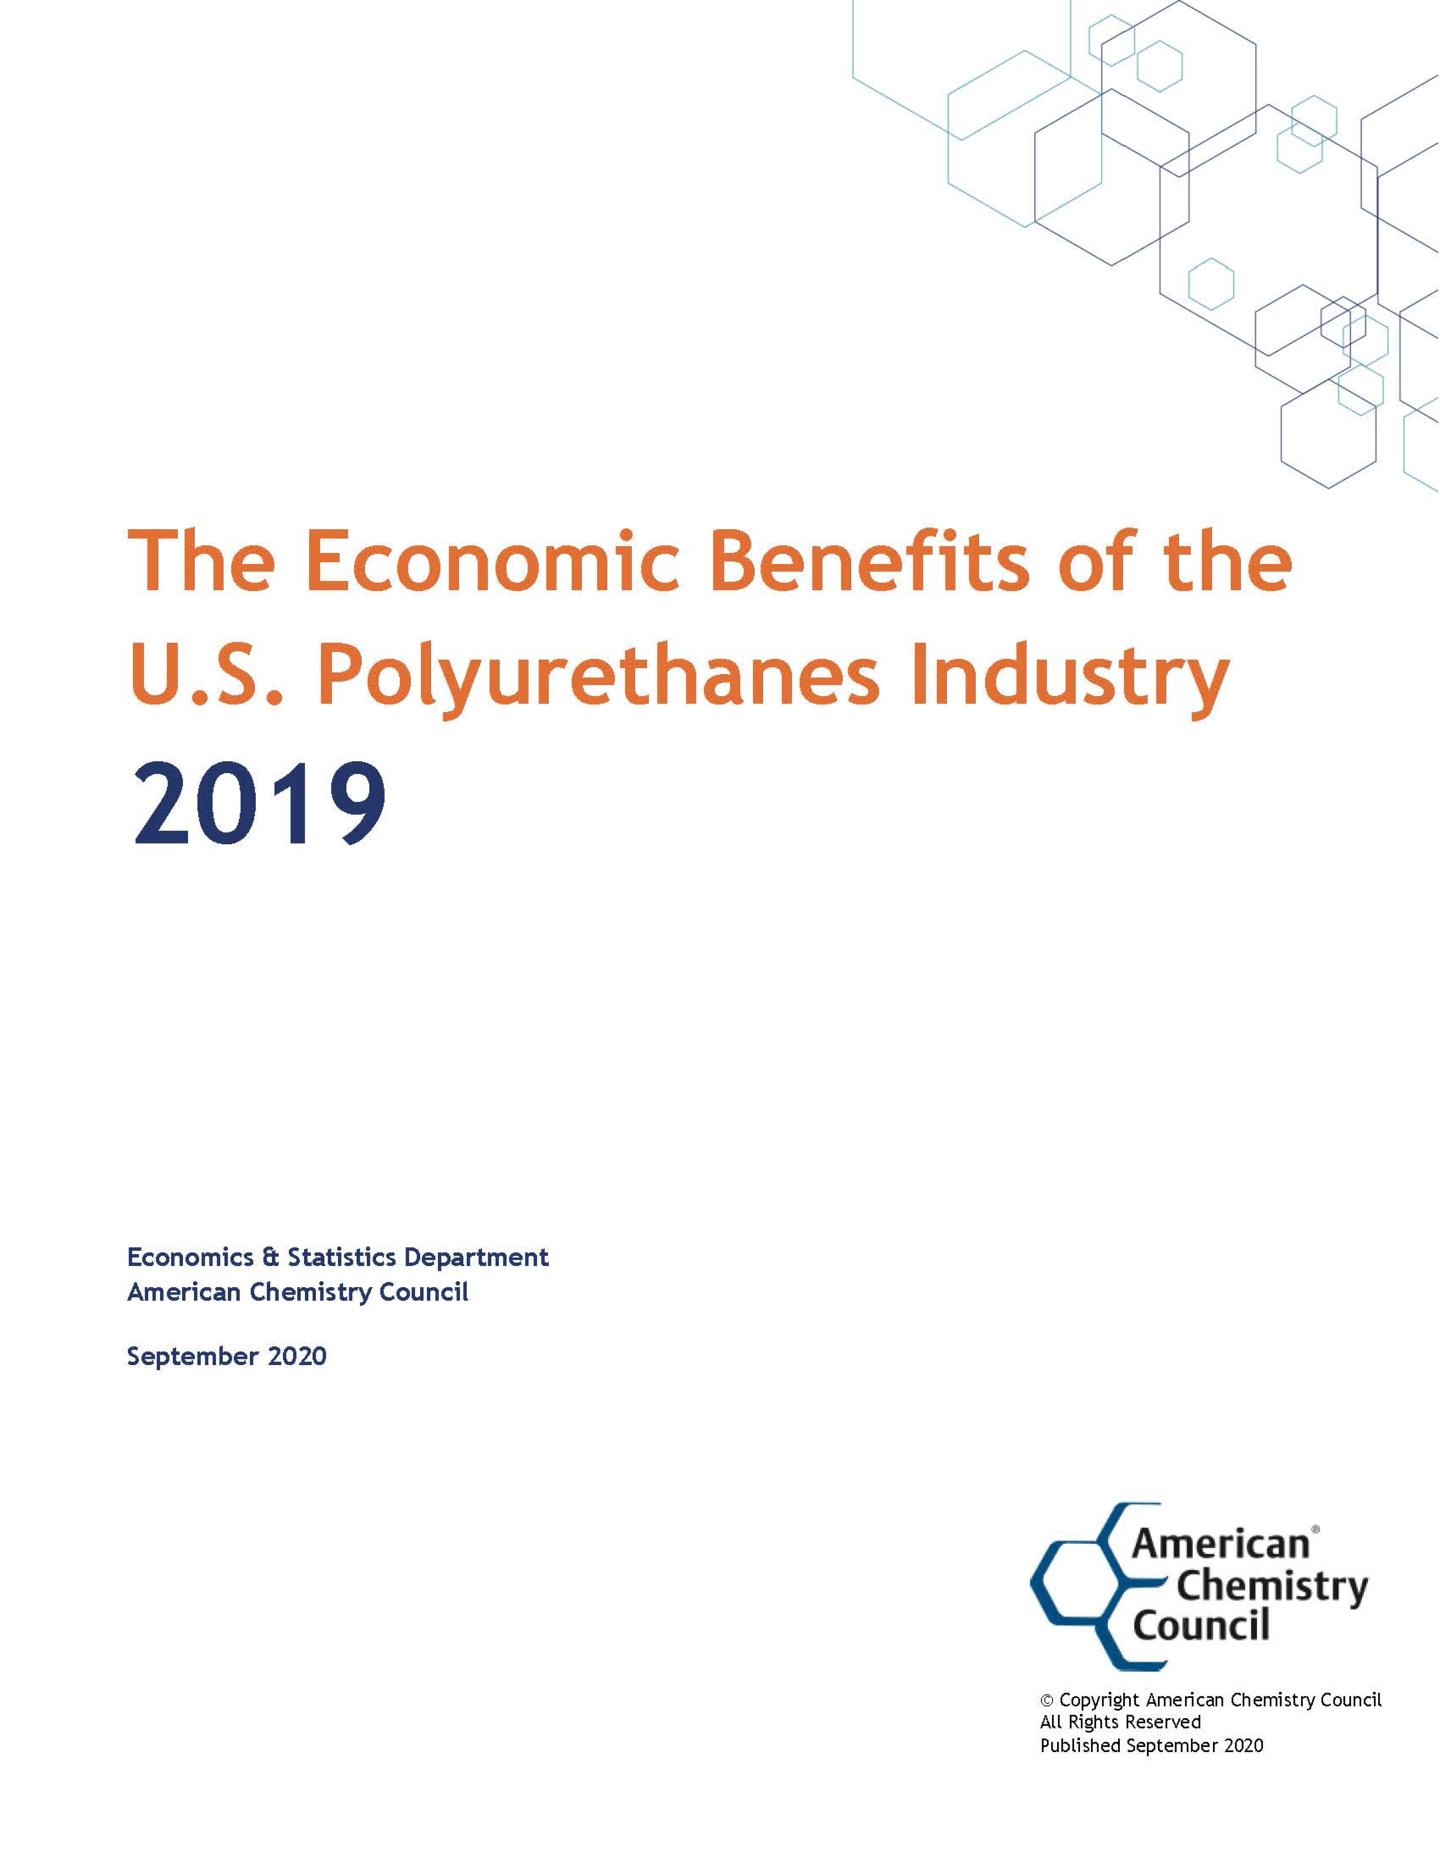 The Economic Benefits of the U.S. Polyurethanes Industry 2019